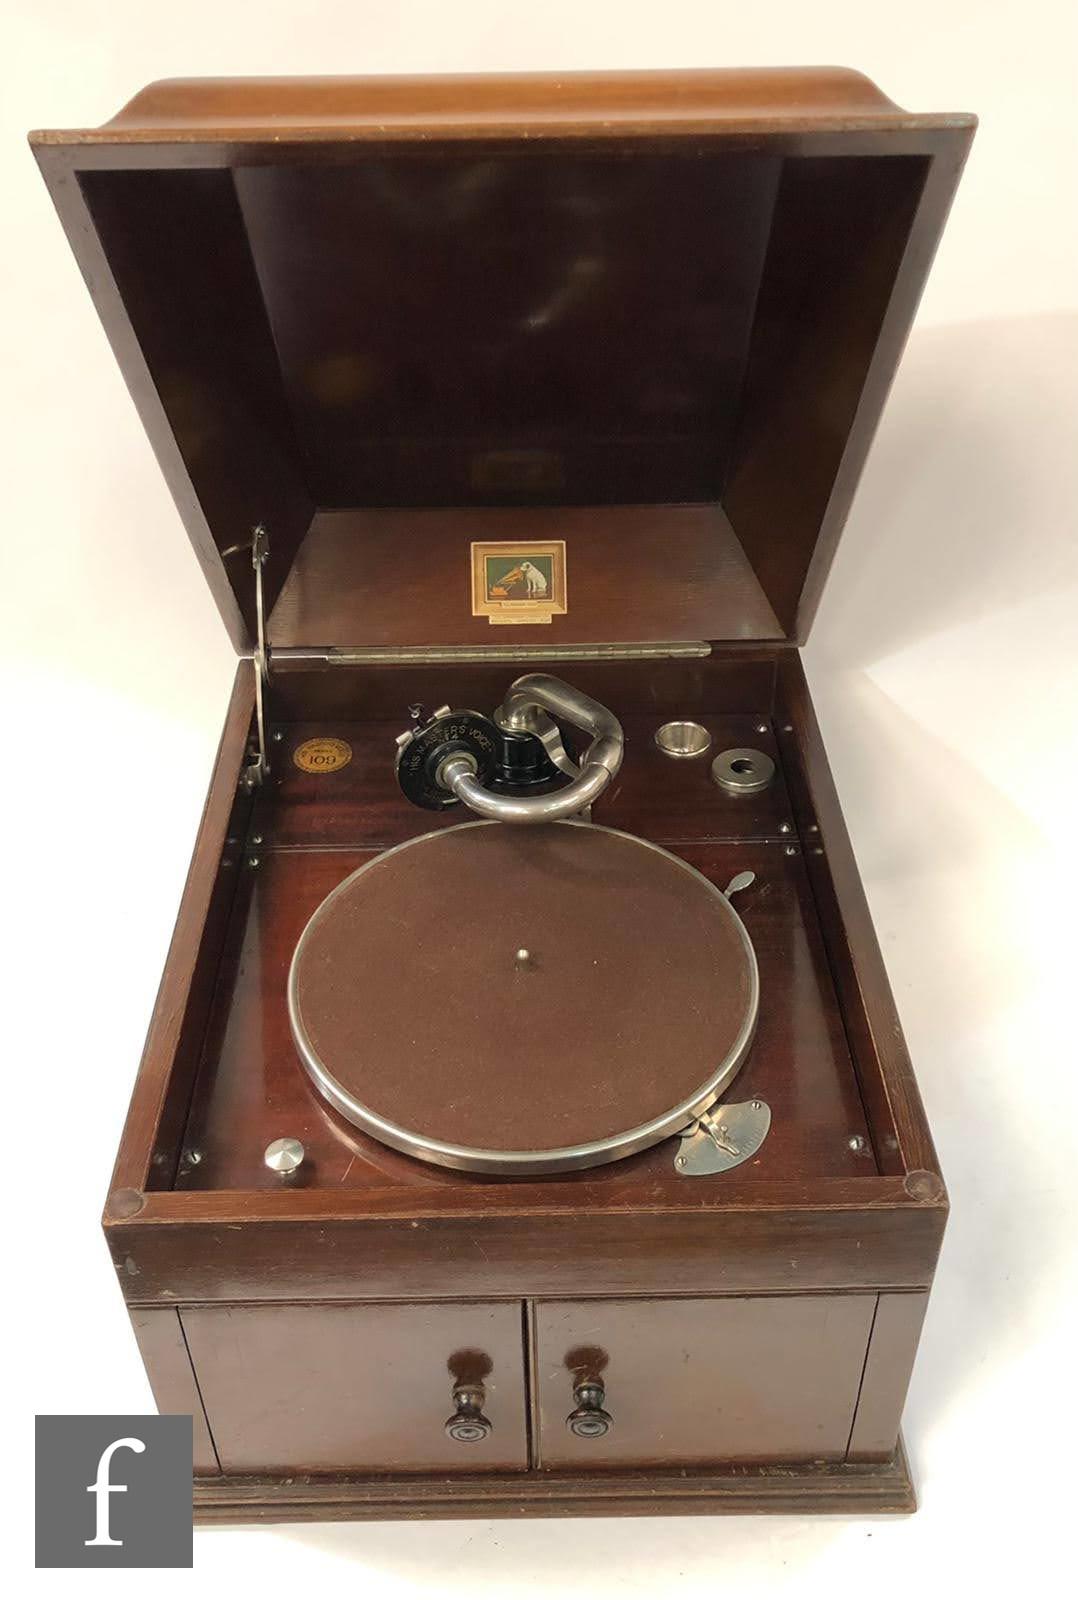 An HMV model 109 mahogany cased table top gramophone, No 4 sound box, width 38cm.